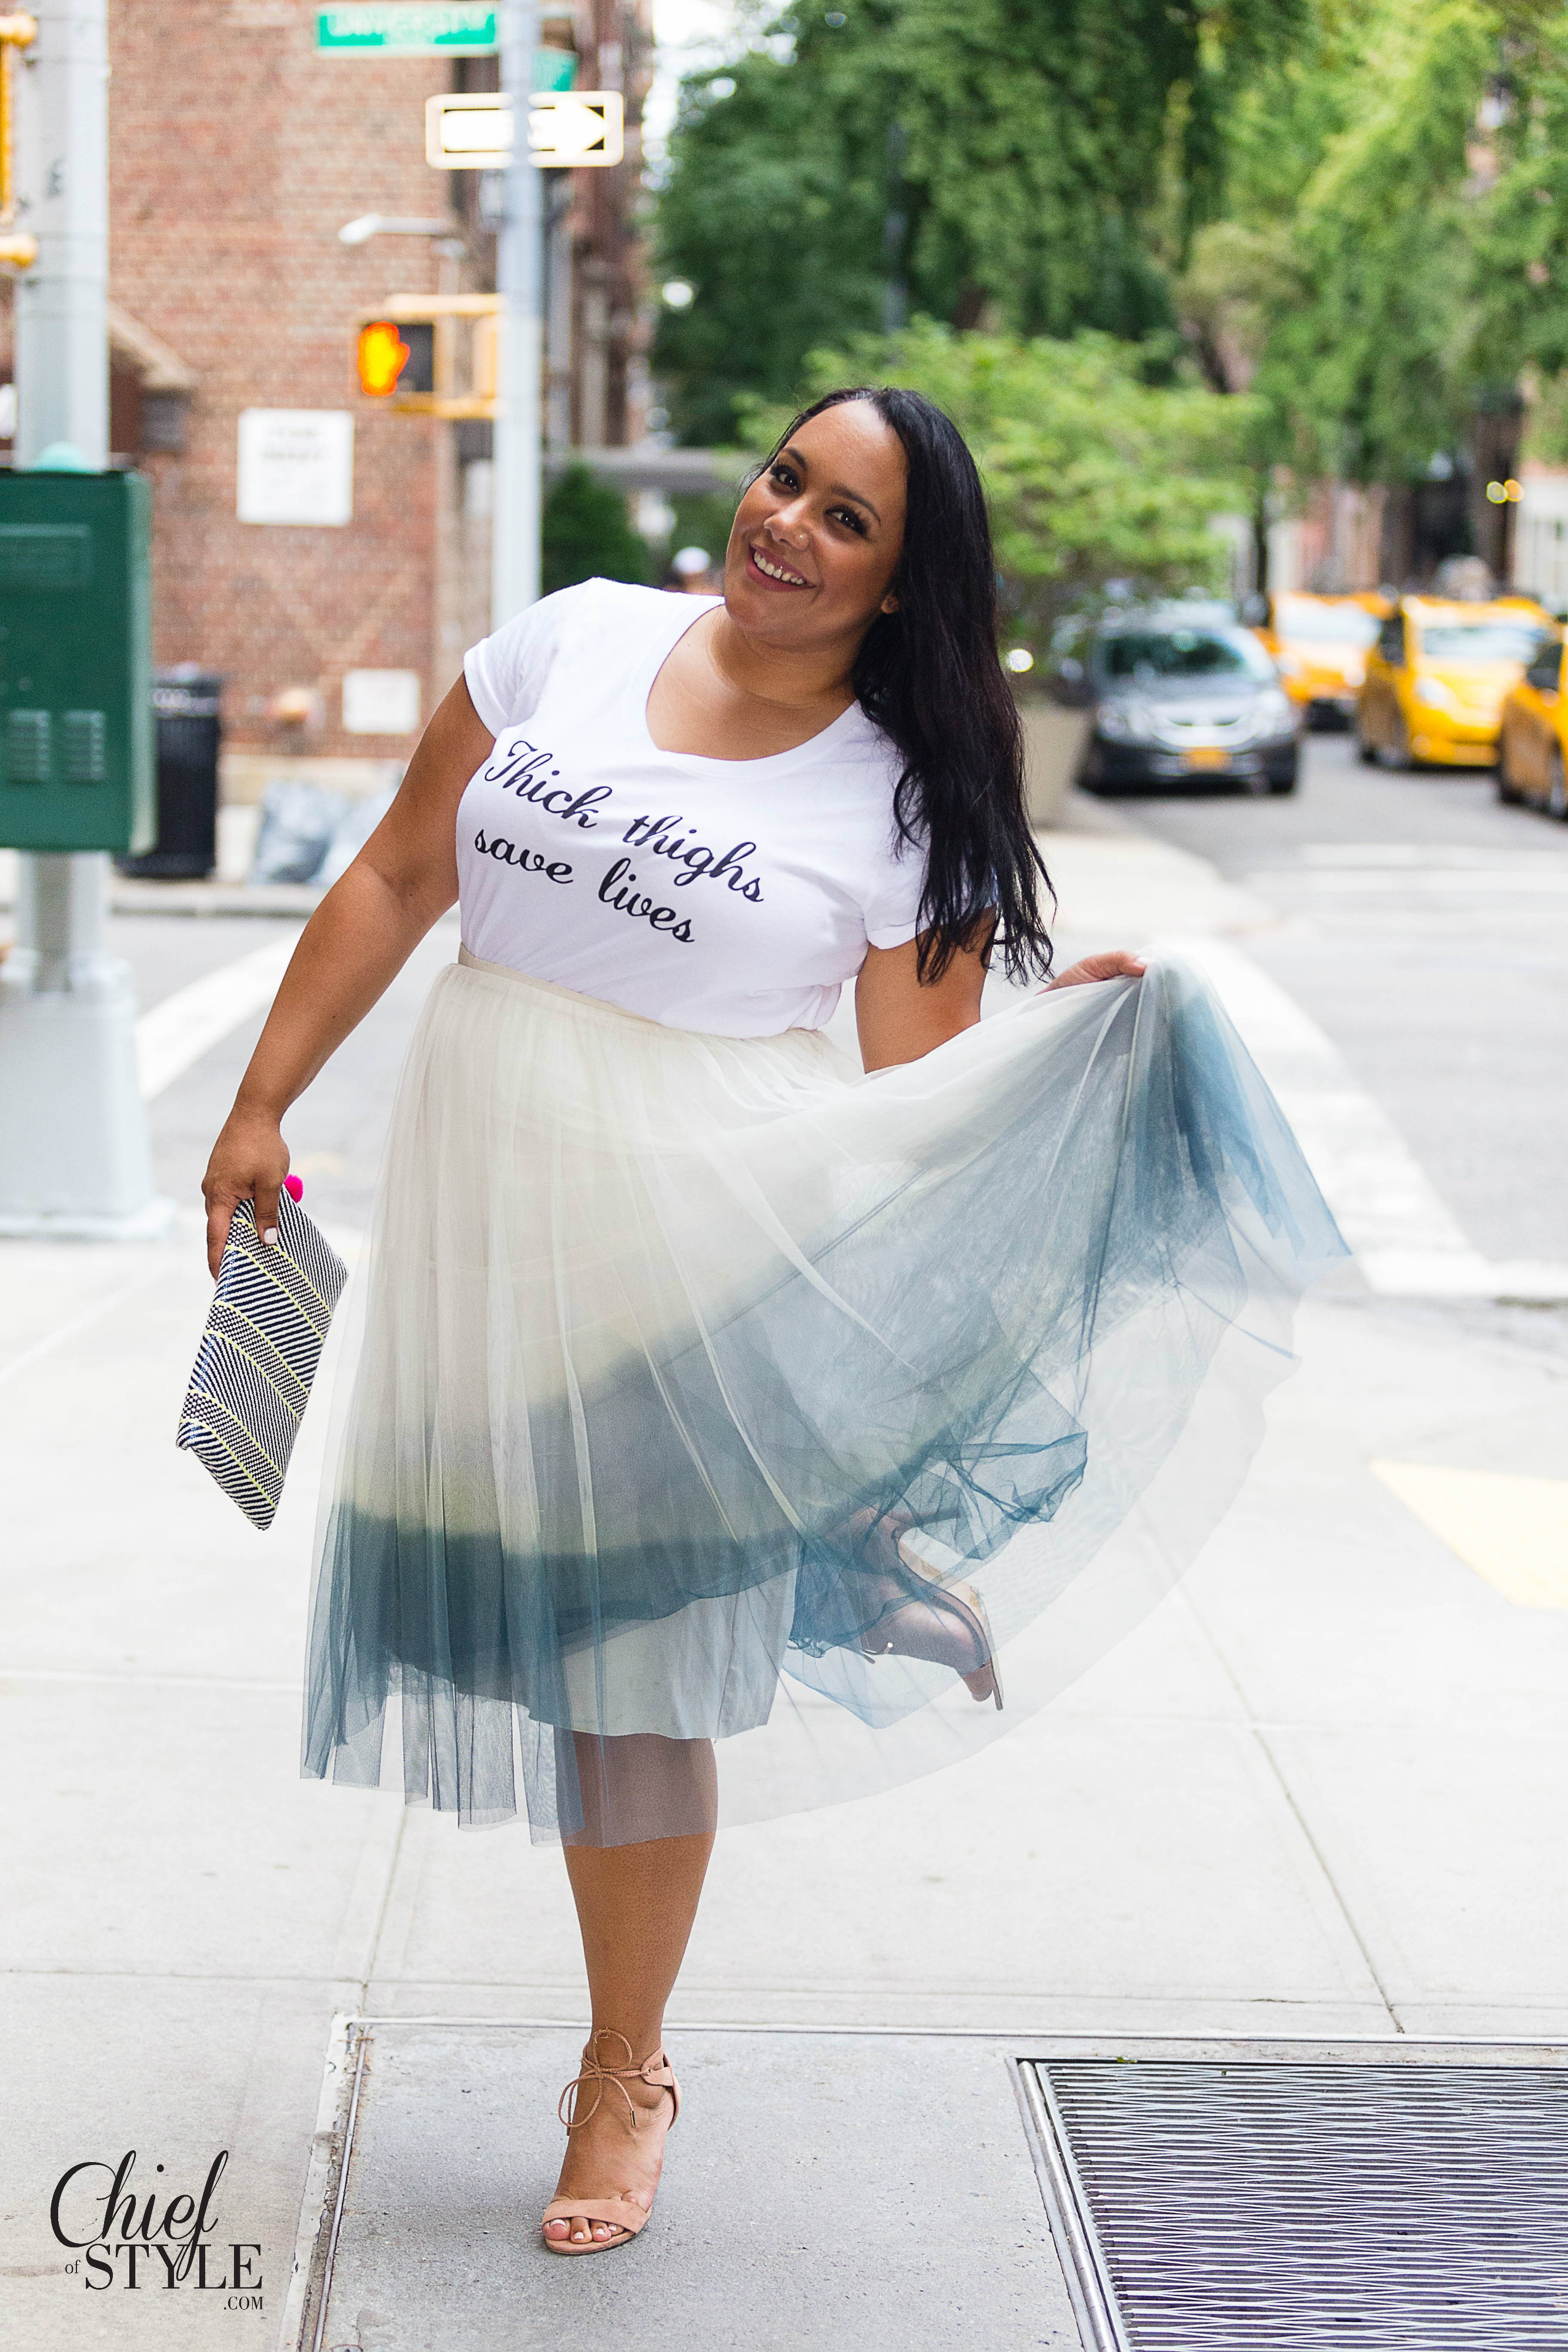 My New York City Carrie Bradshaw Moment